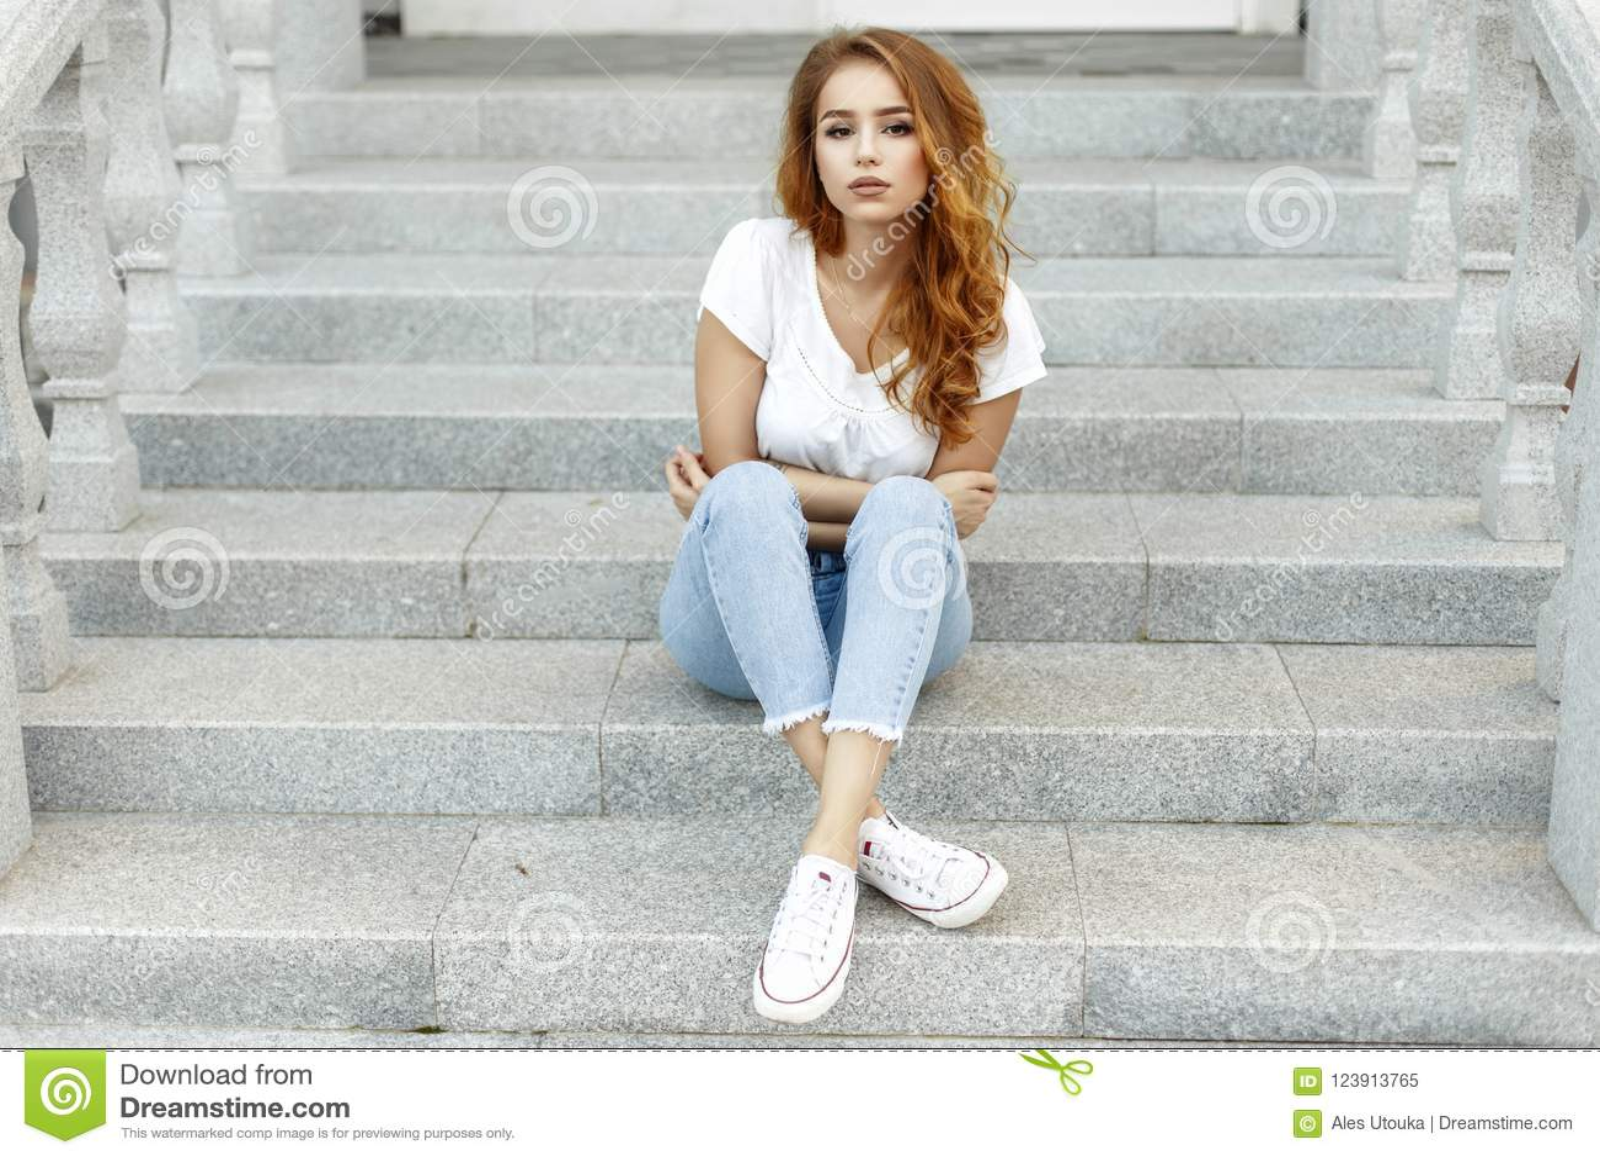 594a8b7b457 Young Beautiful Girl In A White T-shirt